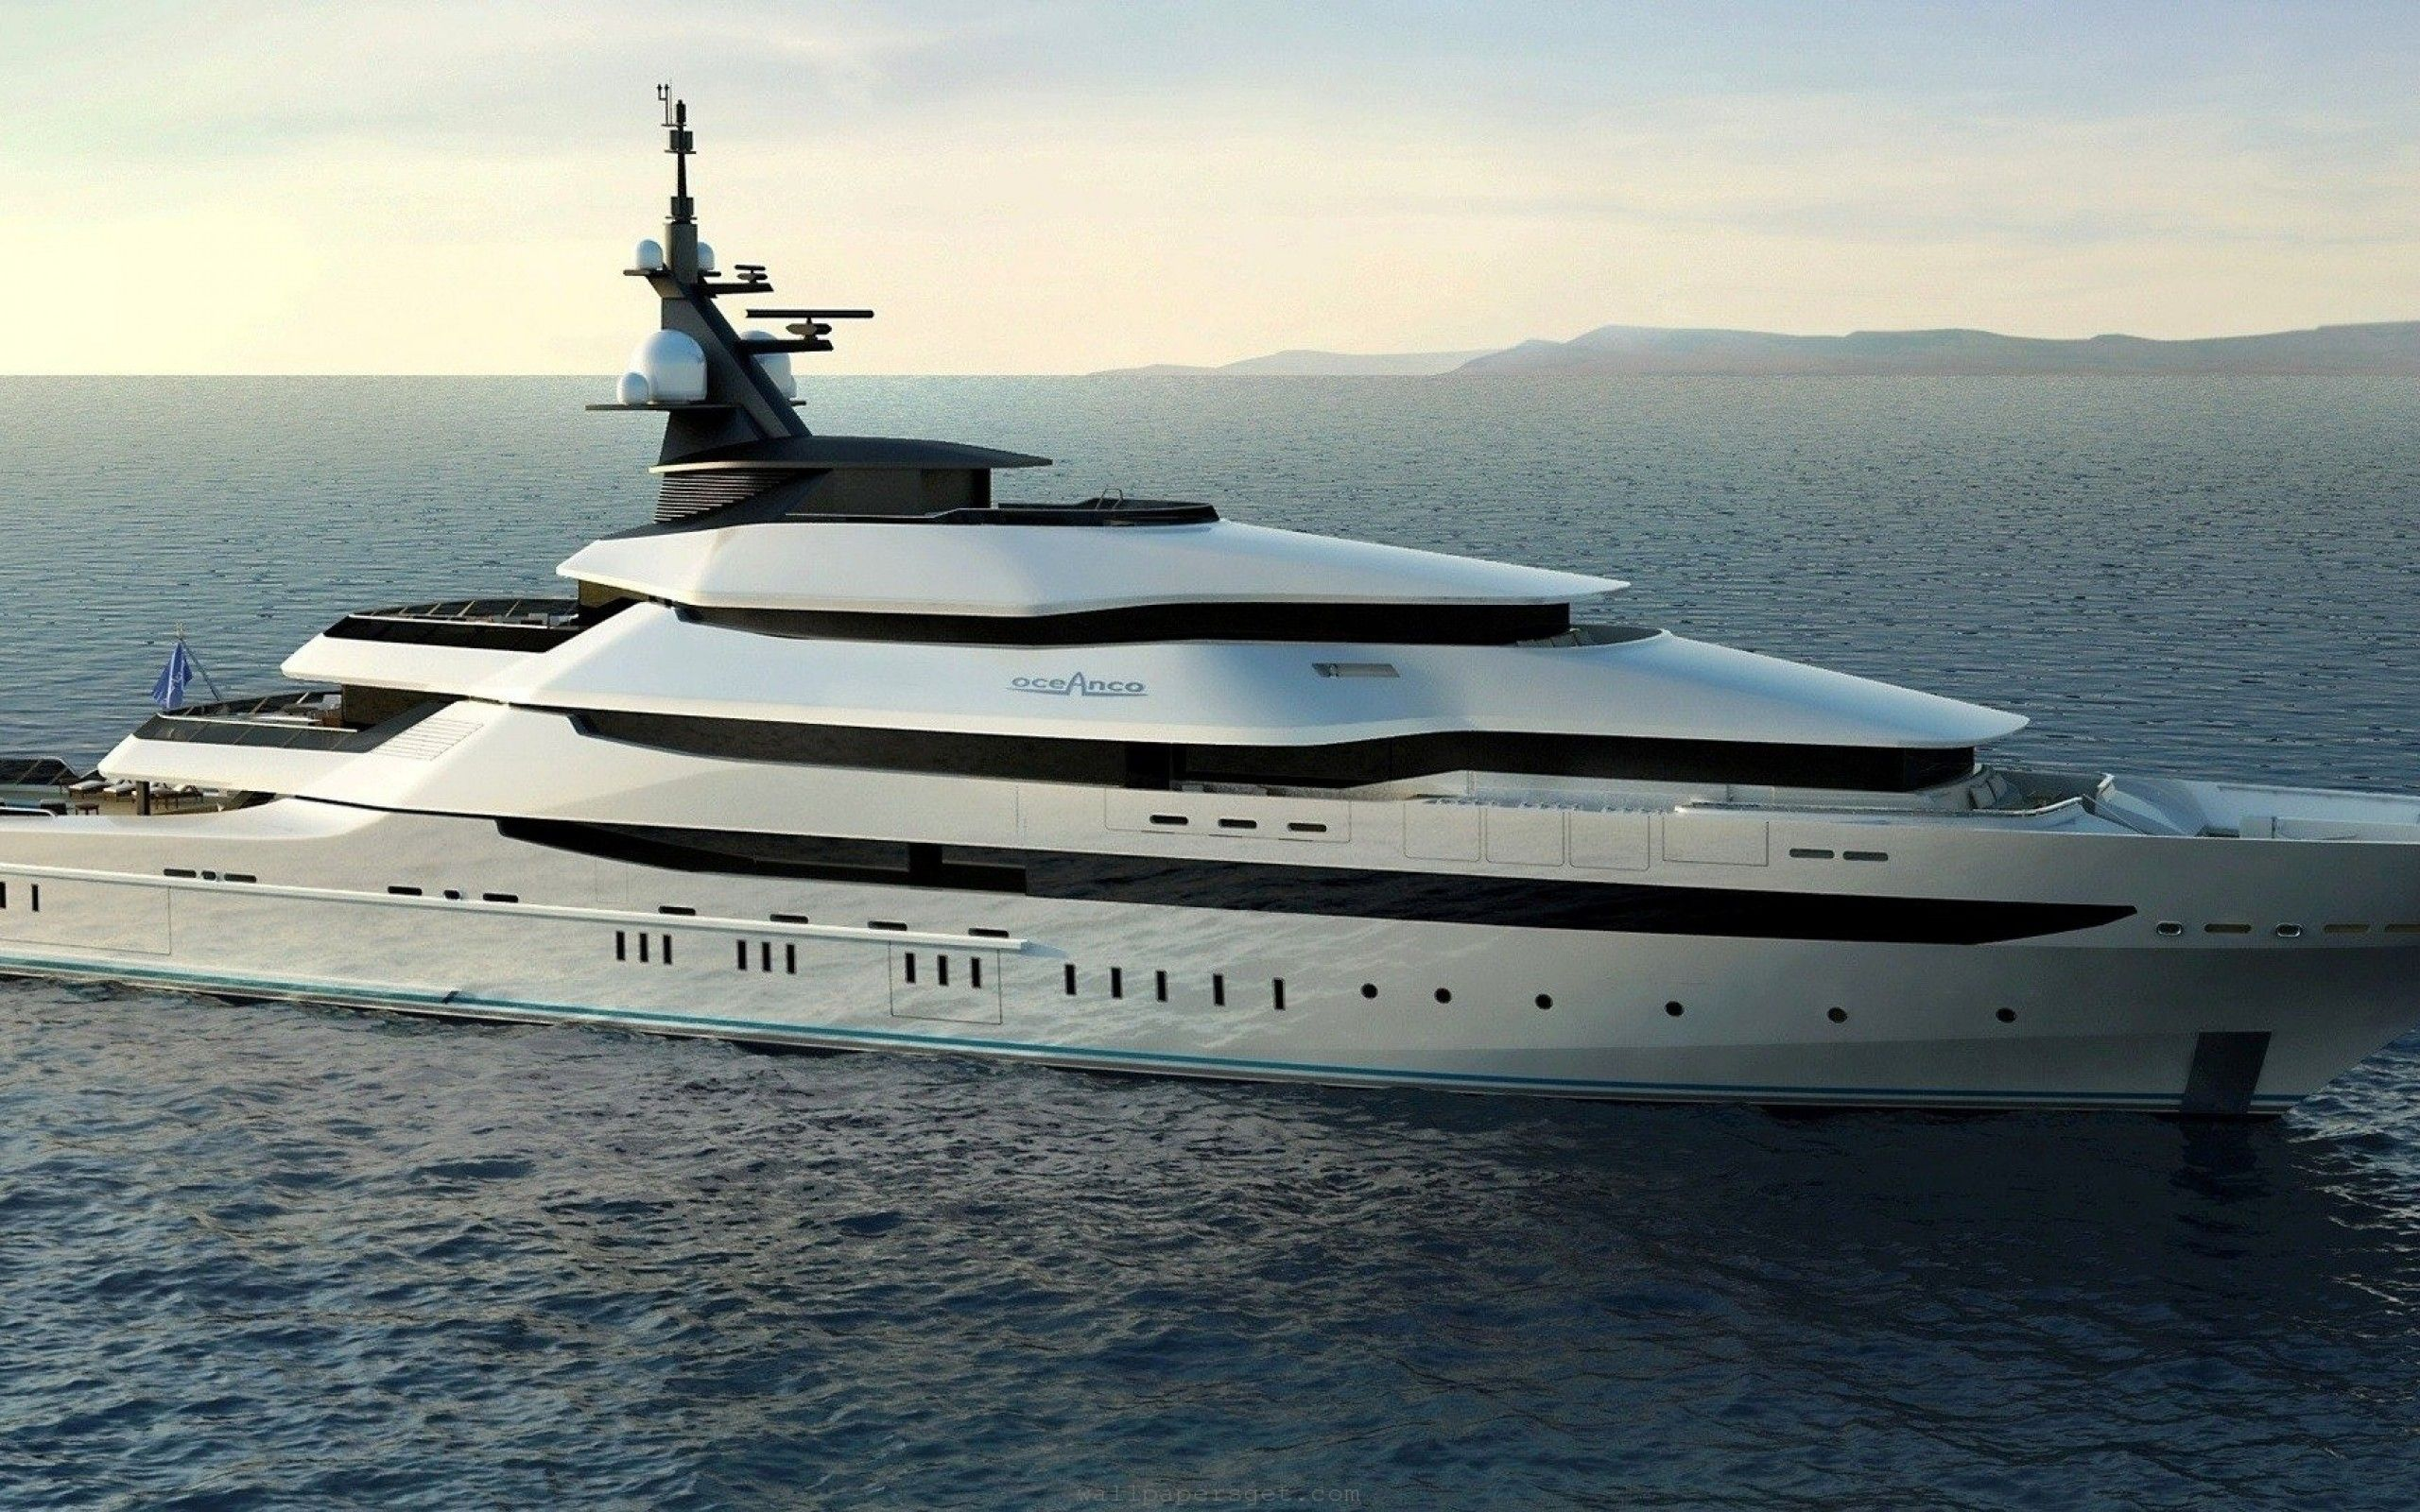 Hd Wallpaper Oceano Yacht 2560x1600 Curvy Yacht Builders